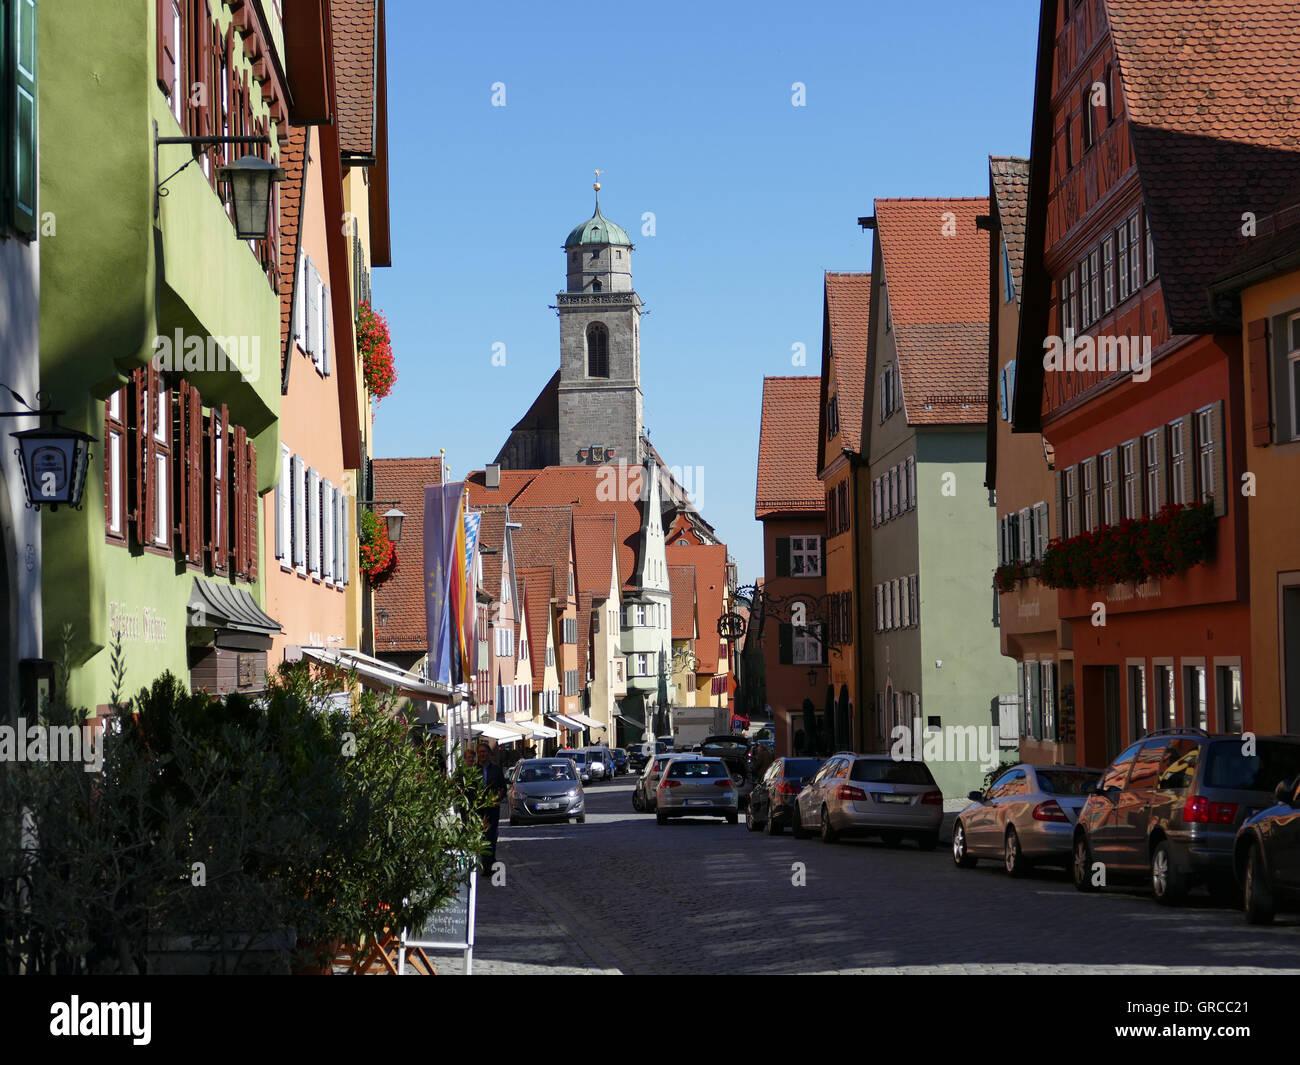 Dinkelsbuehl At Romantic Road - Stock Image